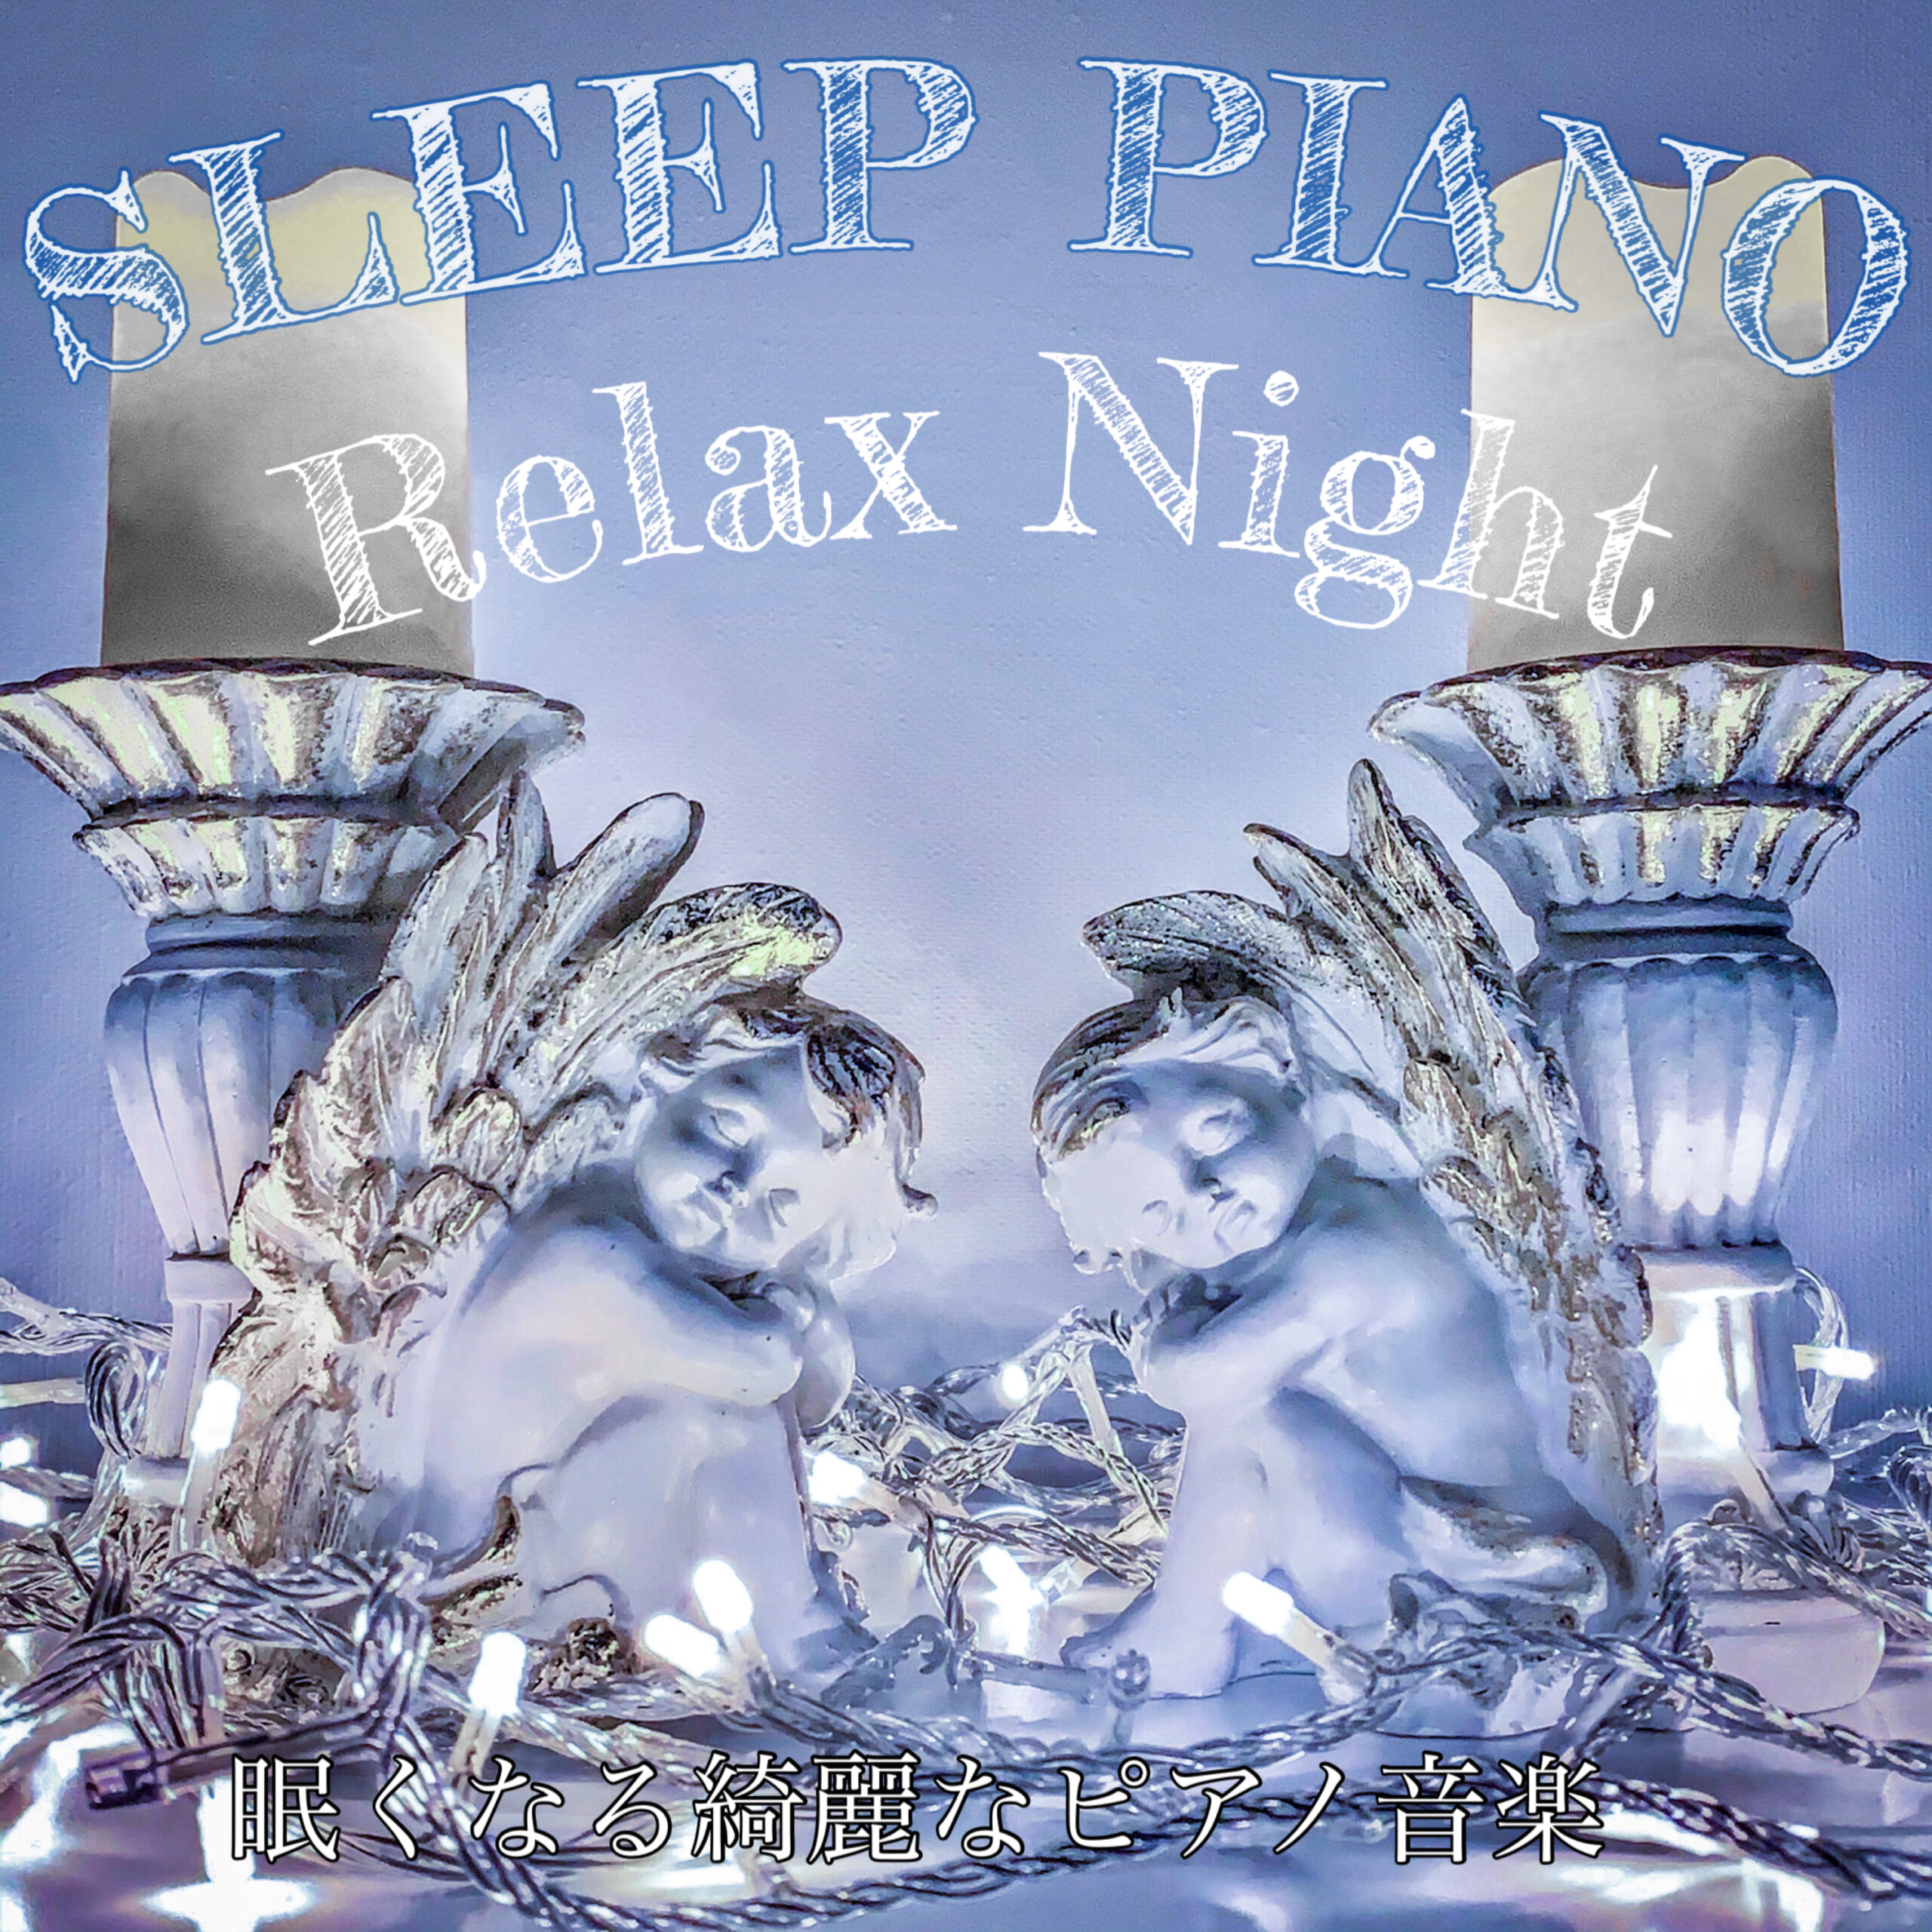 SLEEP PIANO Relax Night 眠くなる綺麗なピアノ音楽